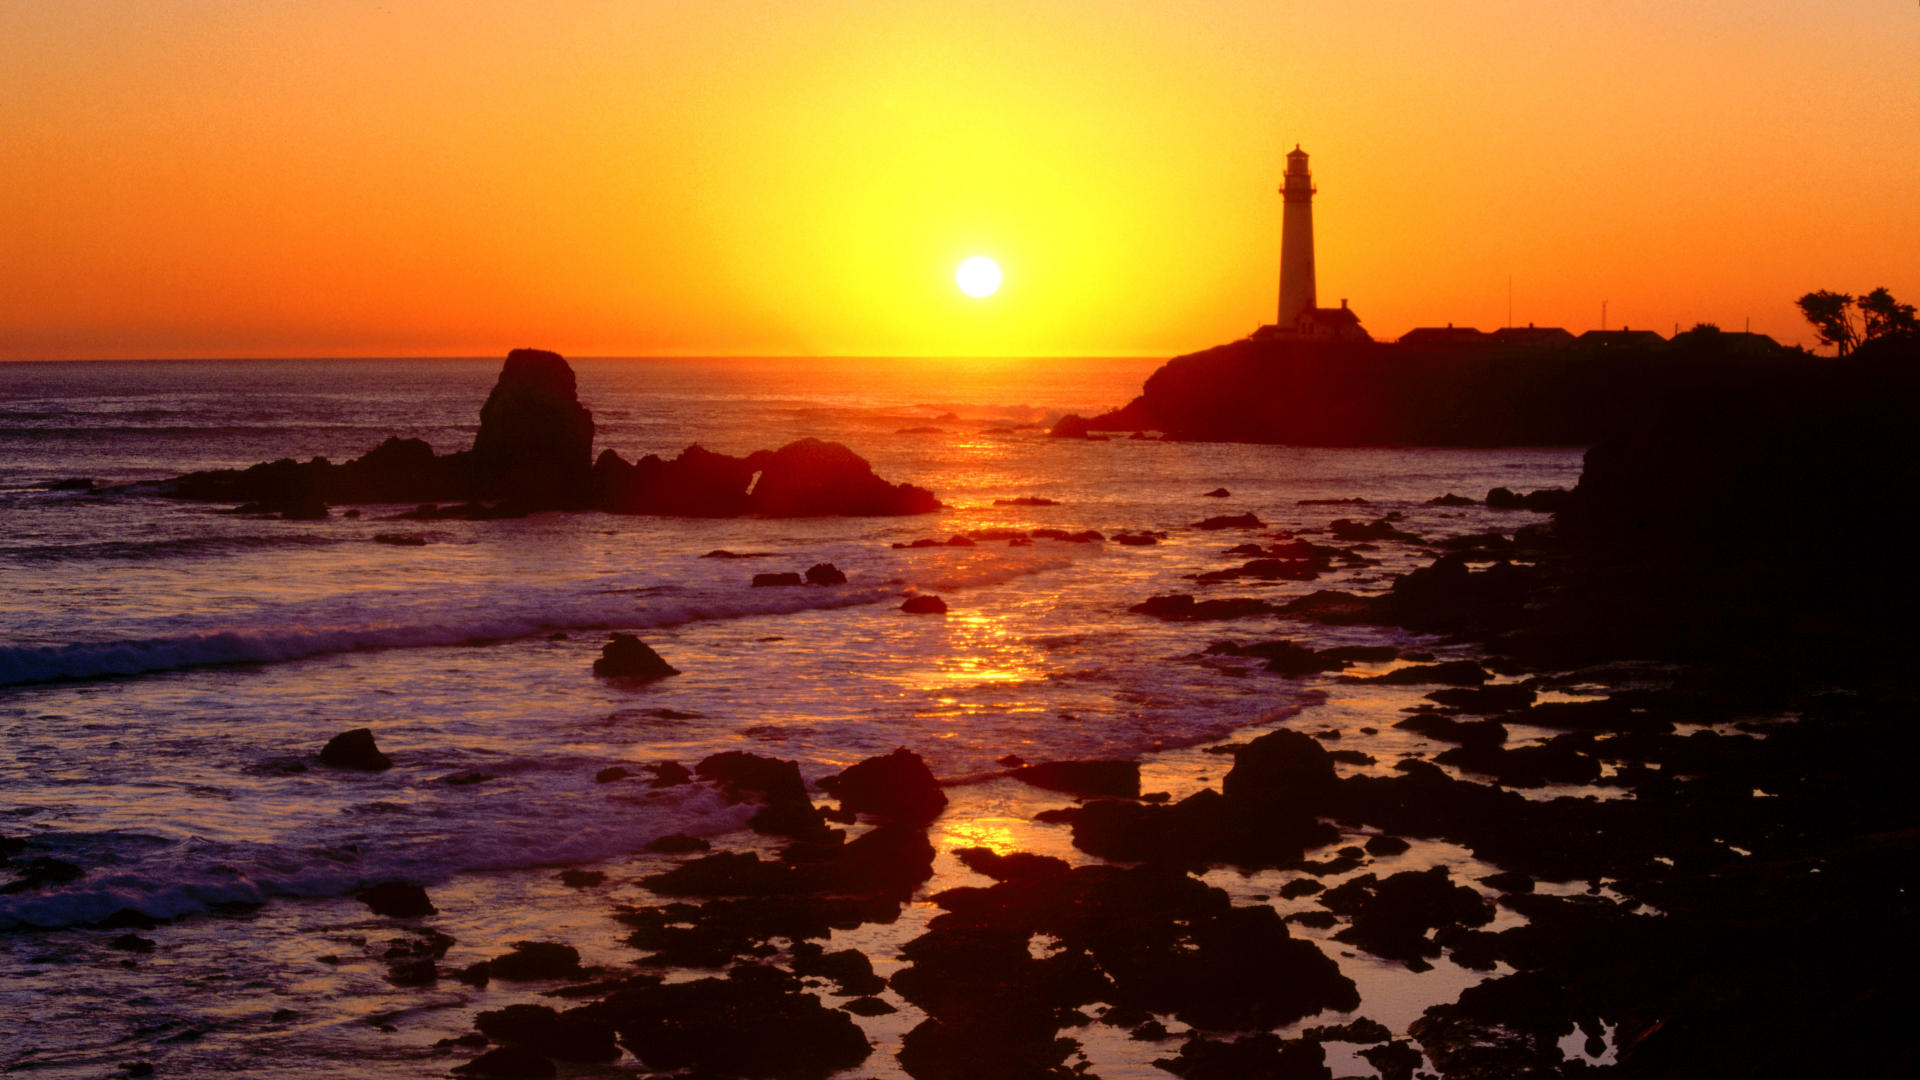 Pacific Ocean Big Sur California Beach 4k Hd Desktop: California Wallpaper For Background